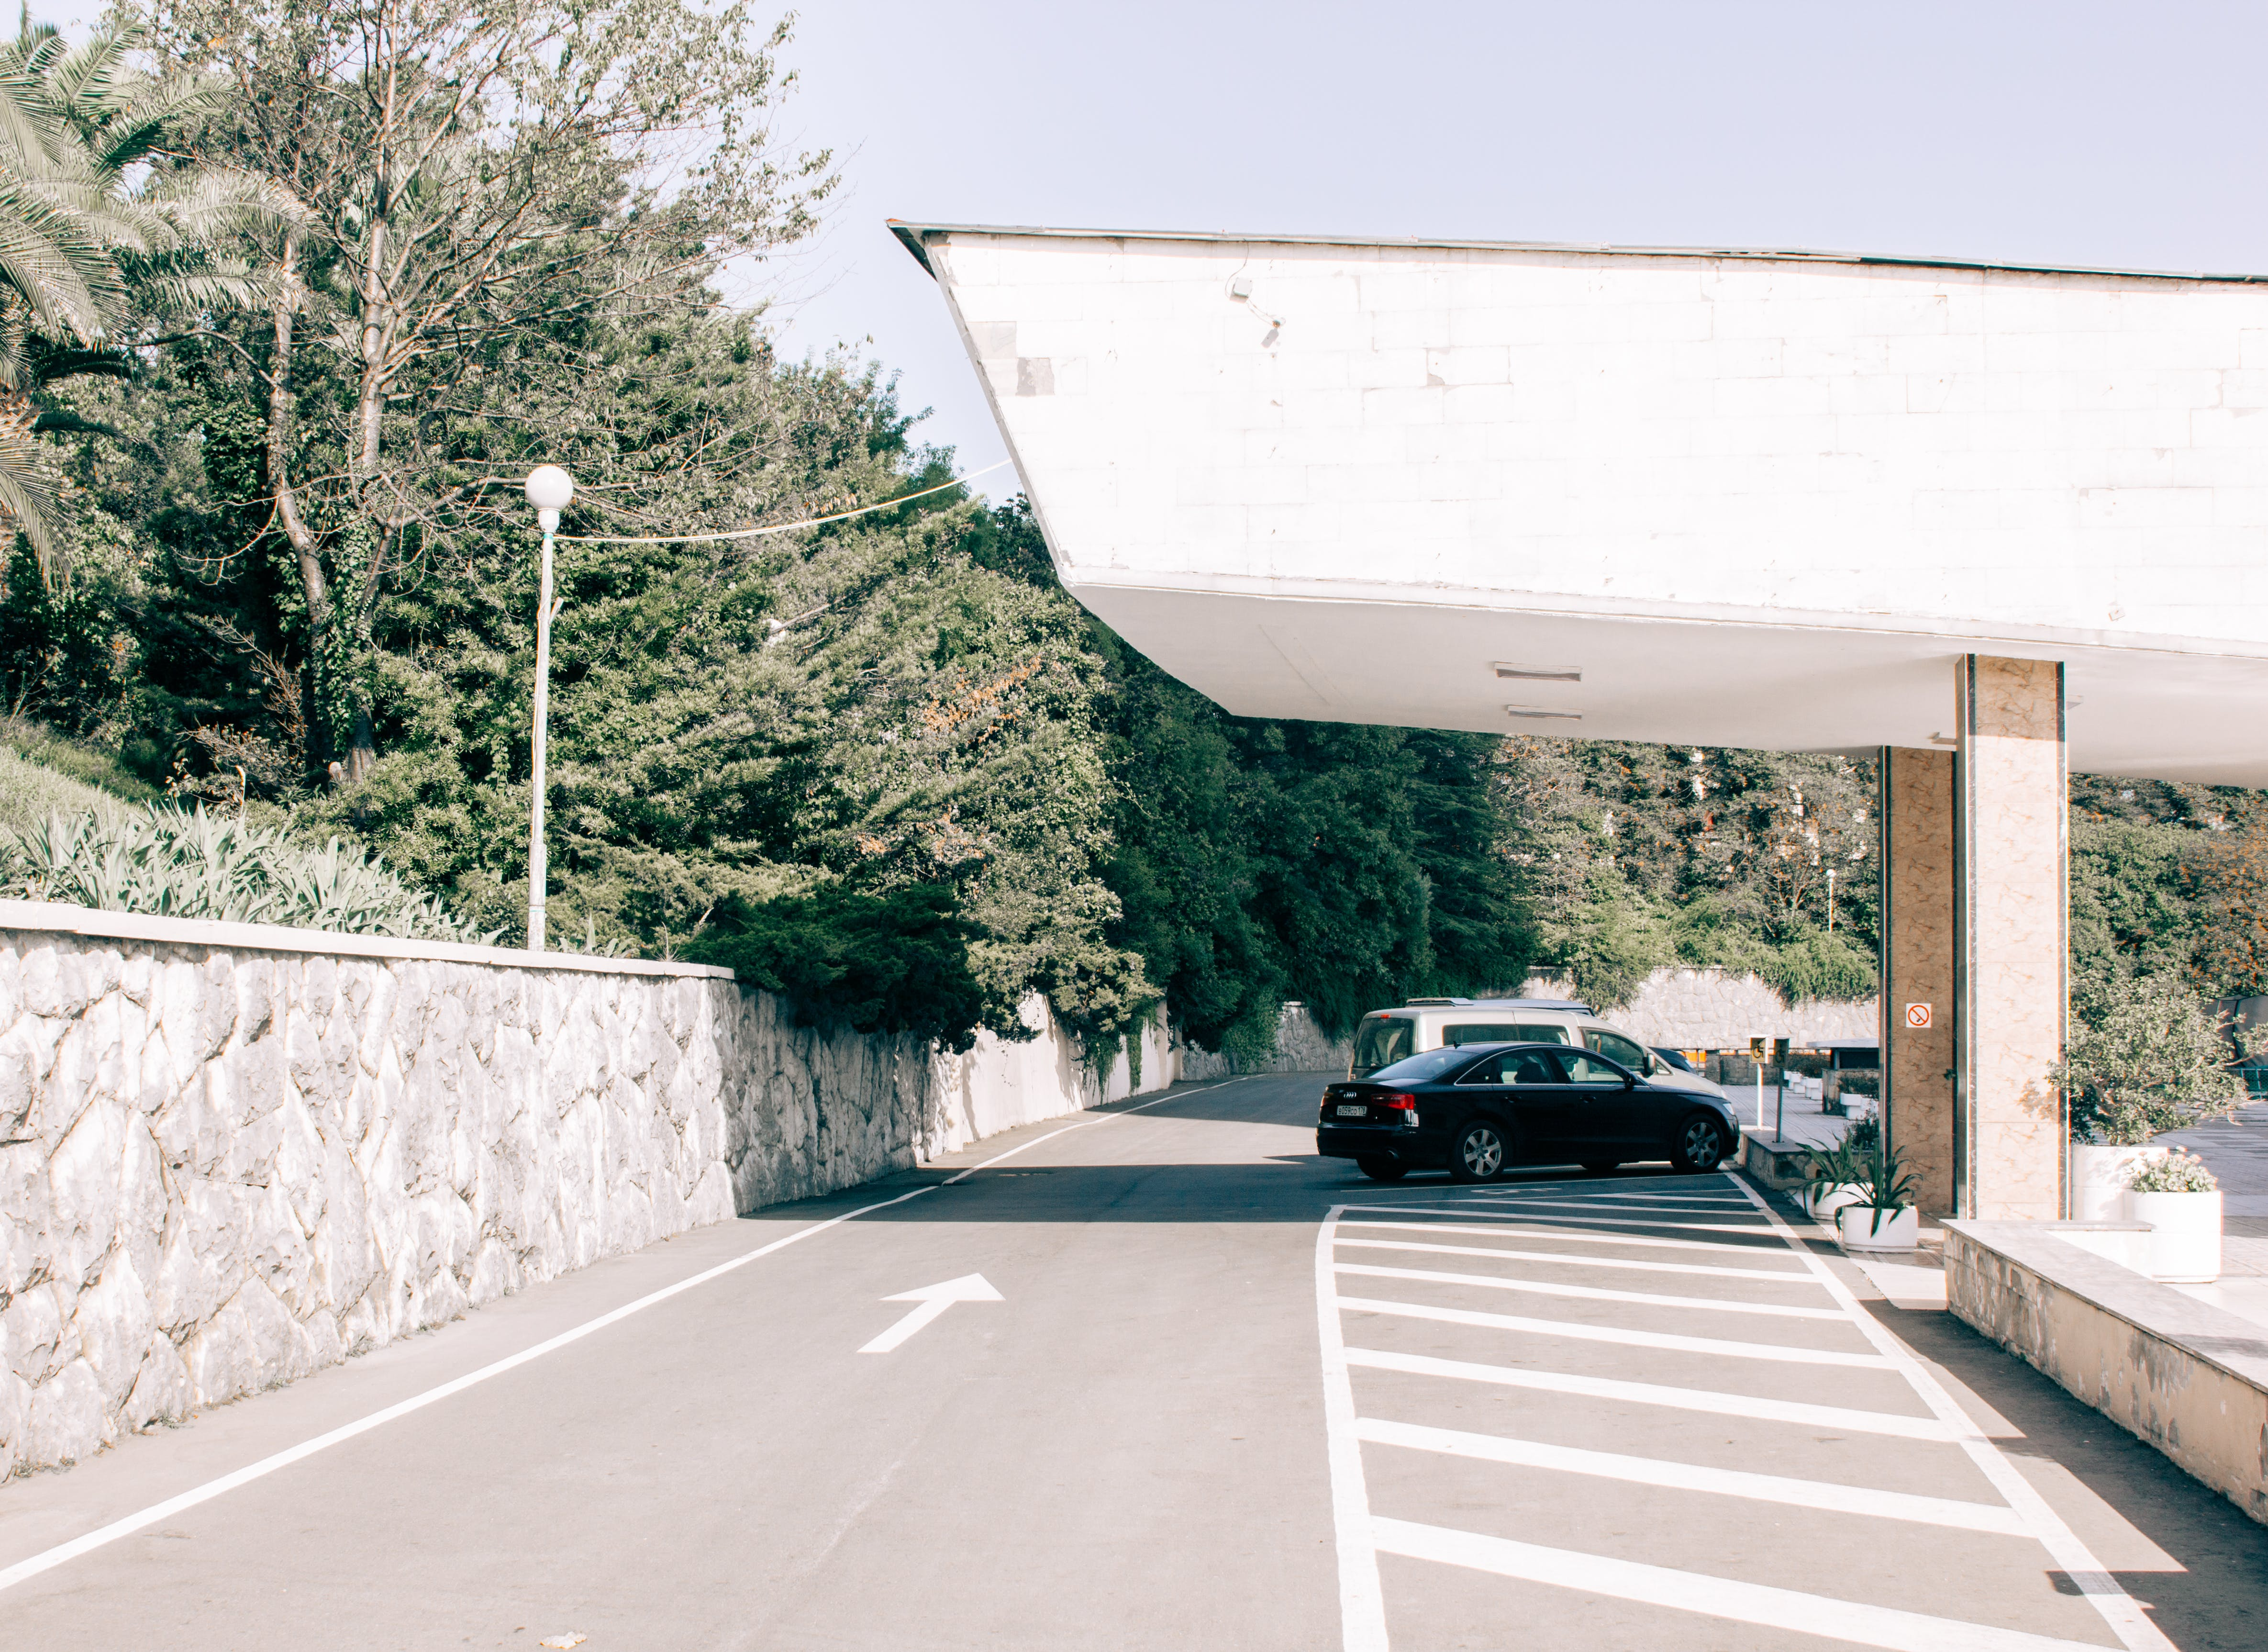 Black Car Parked on Gray Pavement